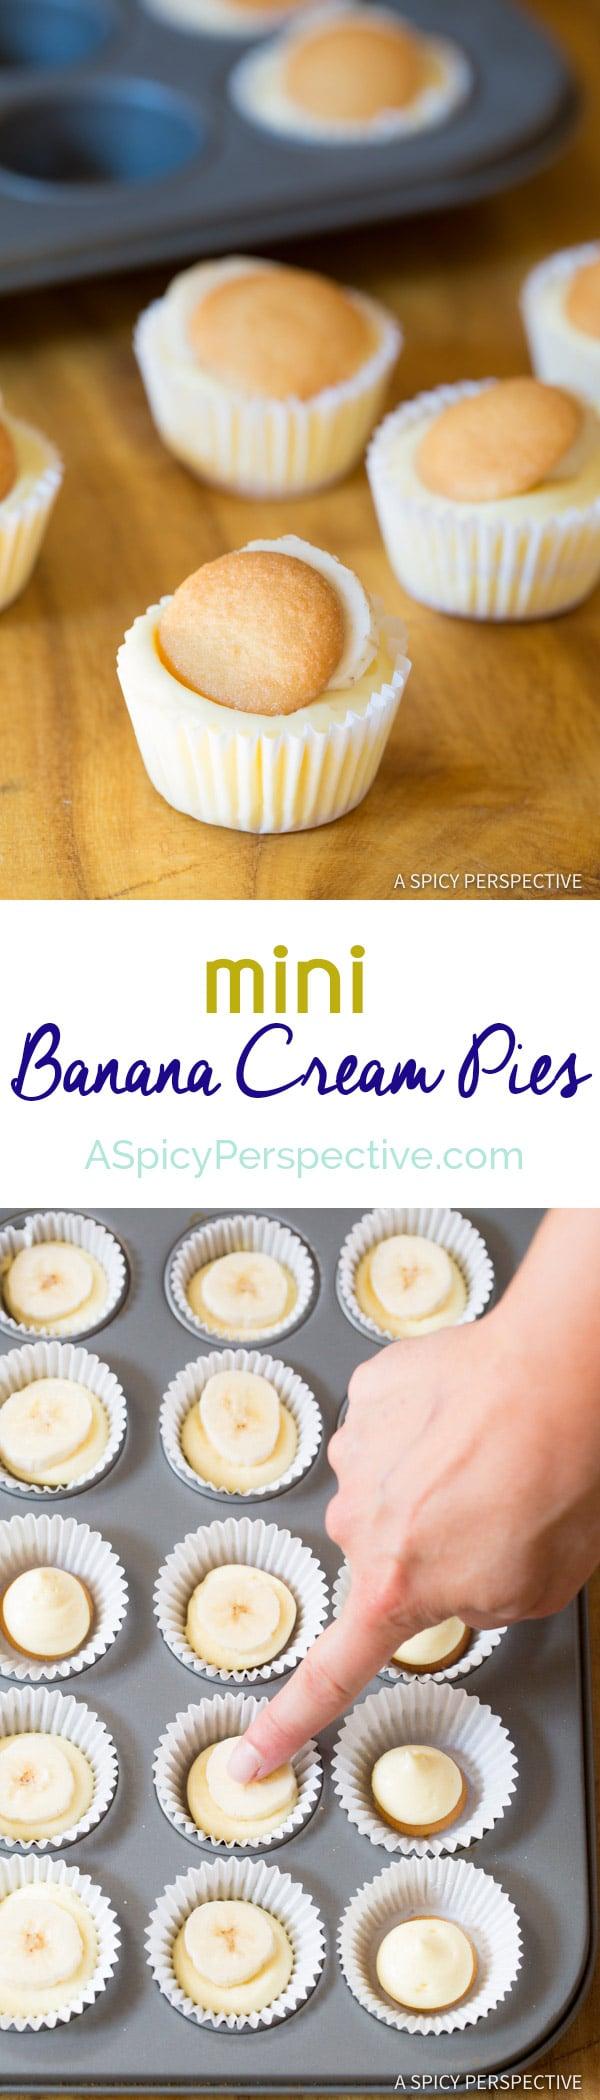 Fun to Make 6-Ingredient Mini Banana Cream Pie Recipe (Banana Pudding Tarts) on ASpicyPerspective.com